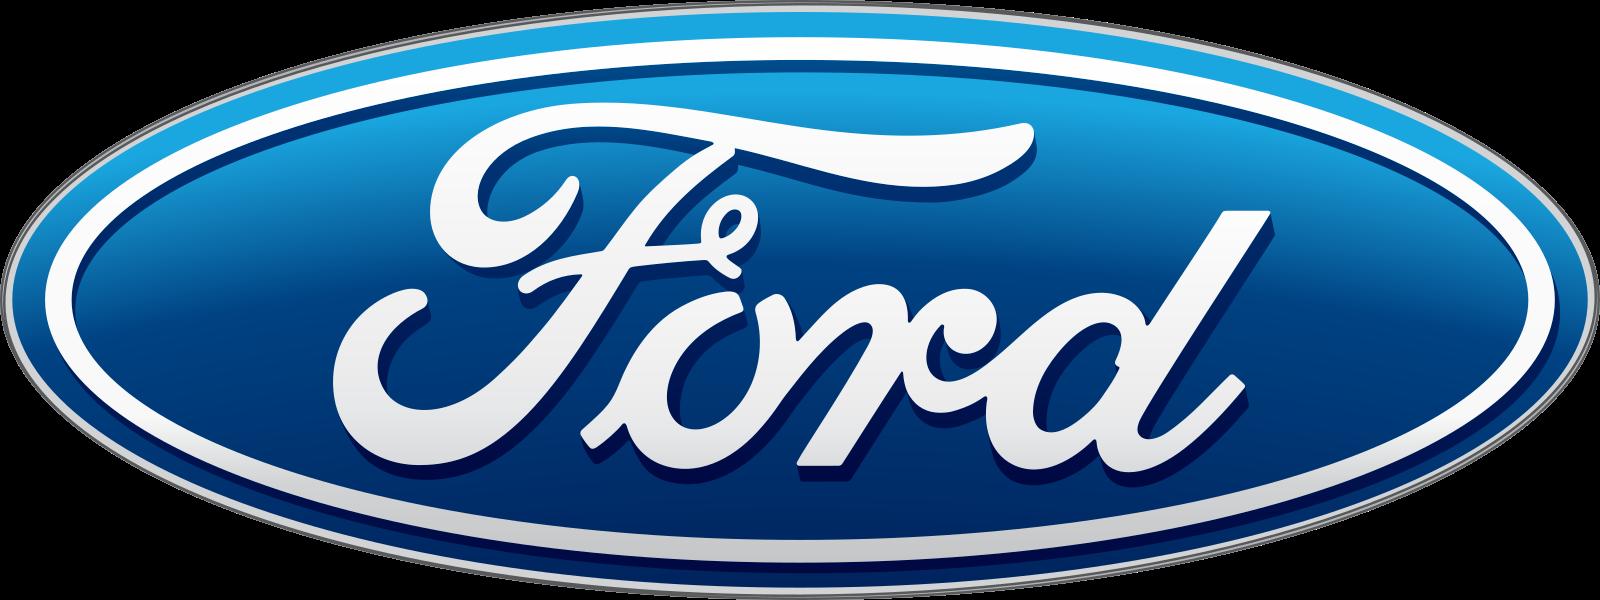 ford logo 2 1 - Ford Logo